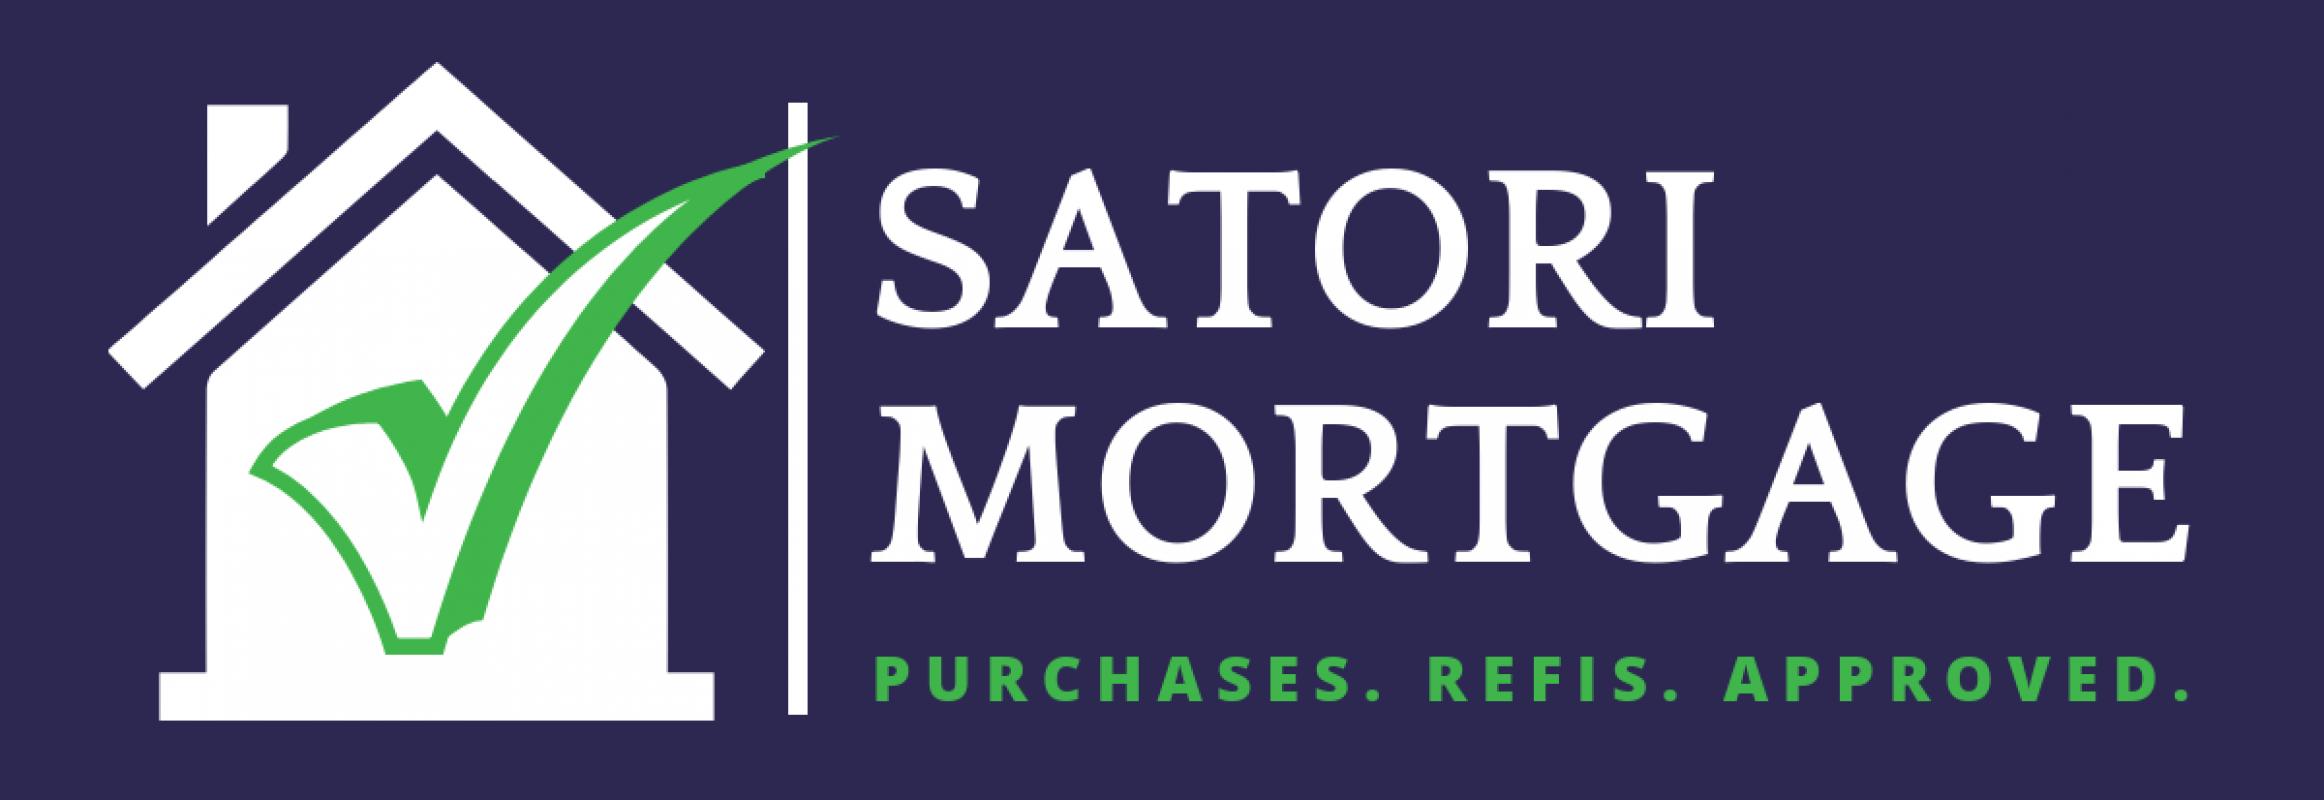 Satori Mortgage logo